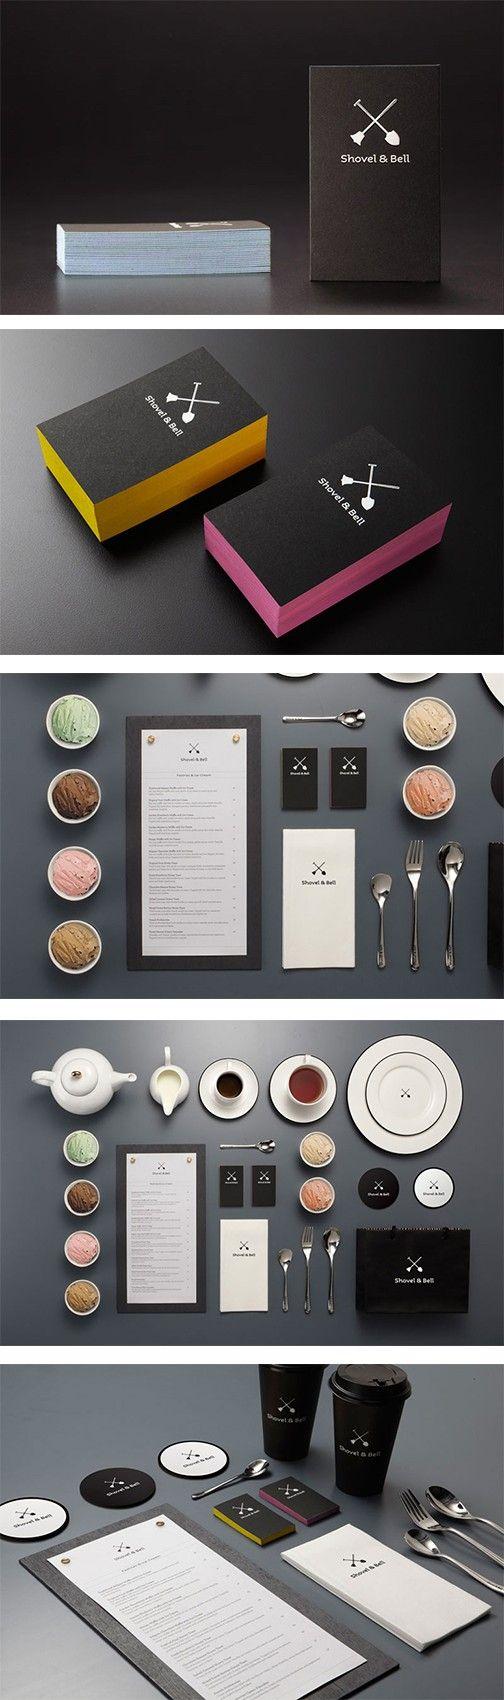 Shovel & Bell | #stationary #corporate #design #corporatedesign #identity #branding #marketing < repinned by www.BlickeDeeler.de | Take a look at www.LogoGestaltung-Hamburg.de